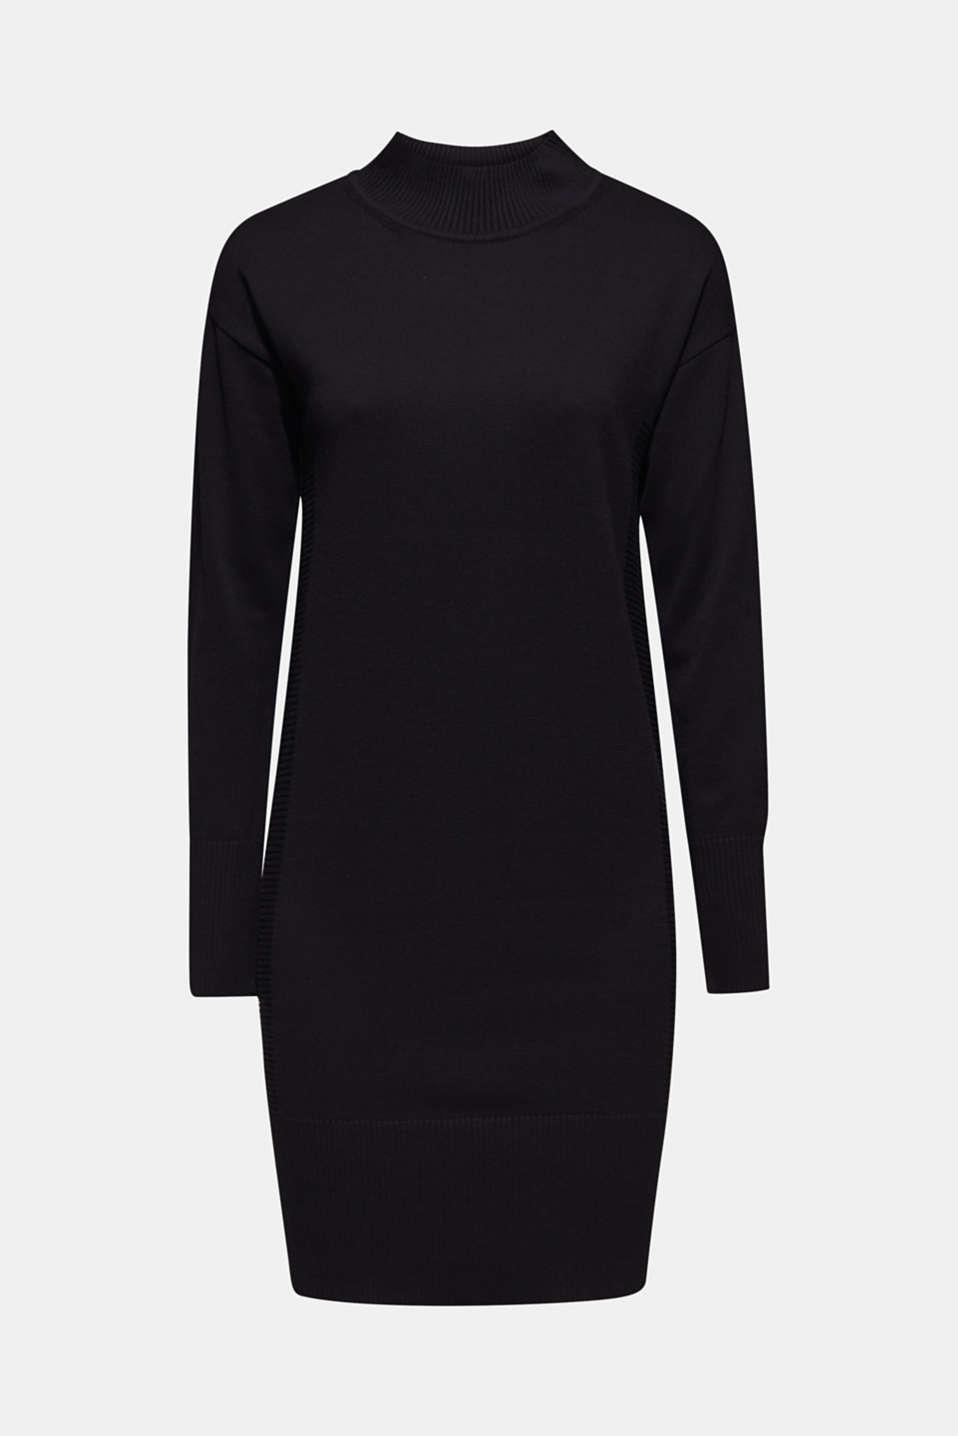 Dresses flat knitted, BLACK, detail image number 7